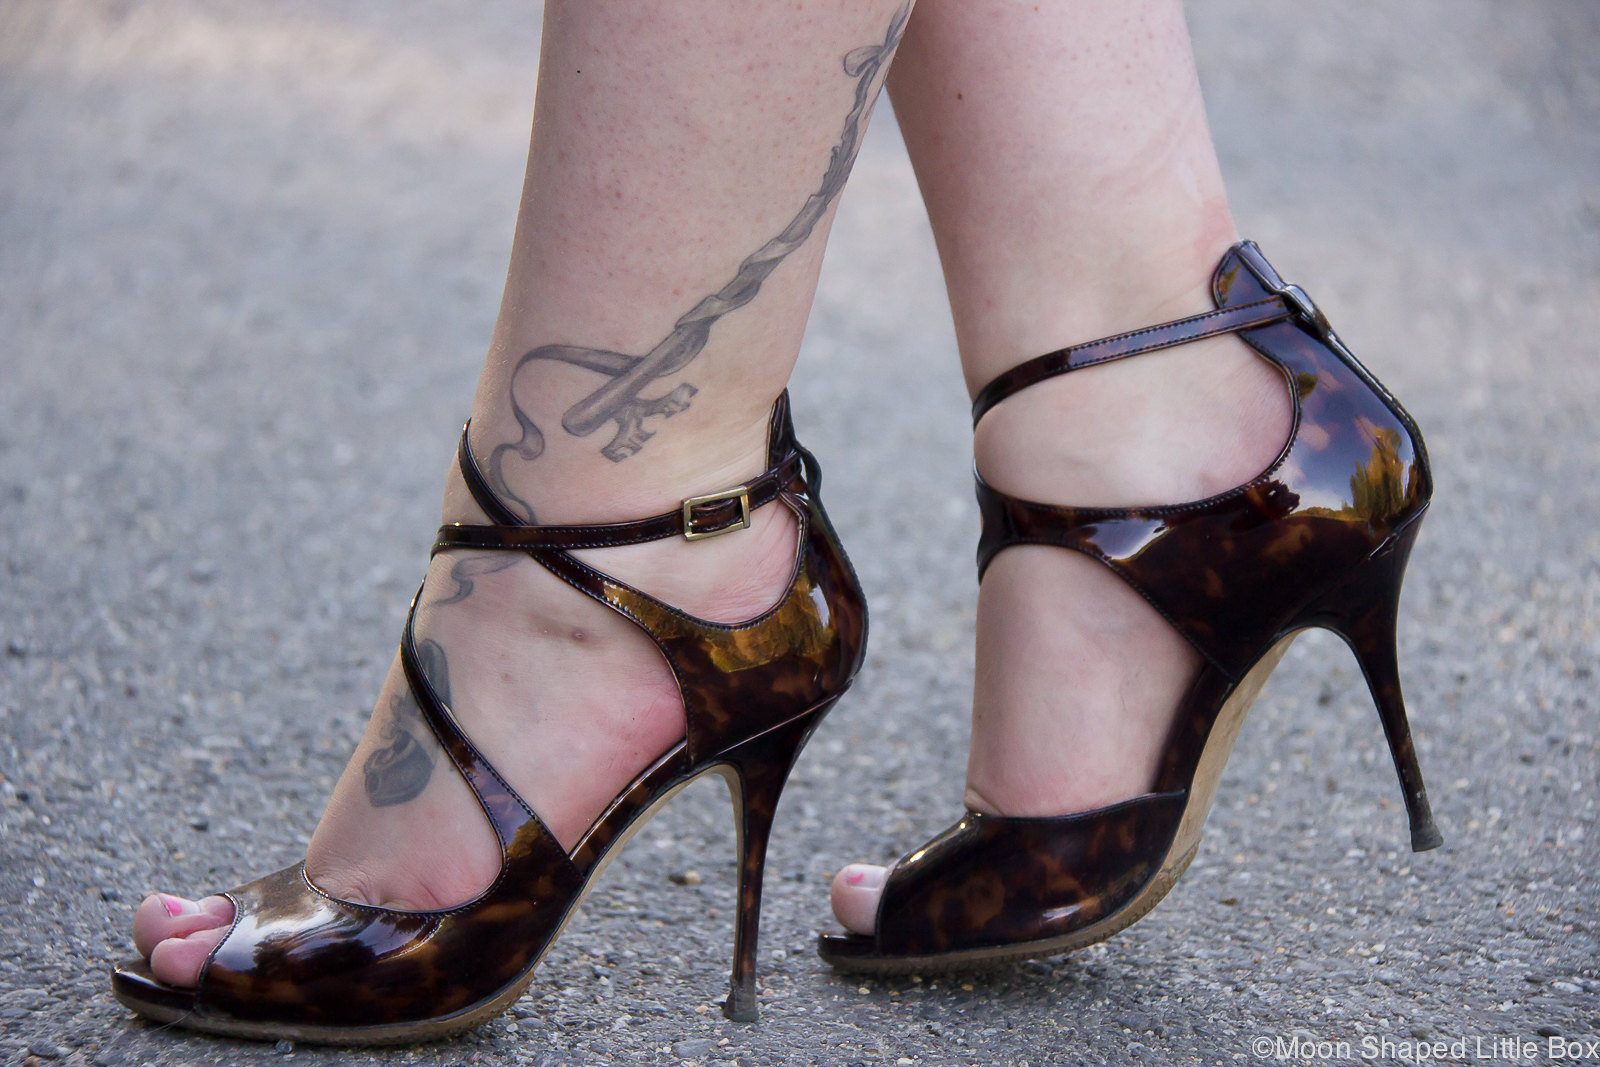 nilkkatatuointi, l k bennett, L.K. Bennett London, shoes